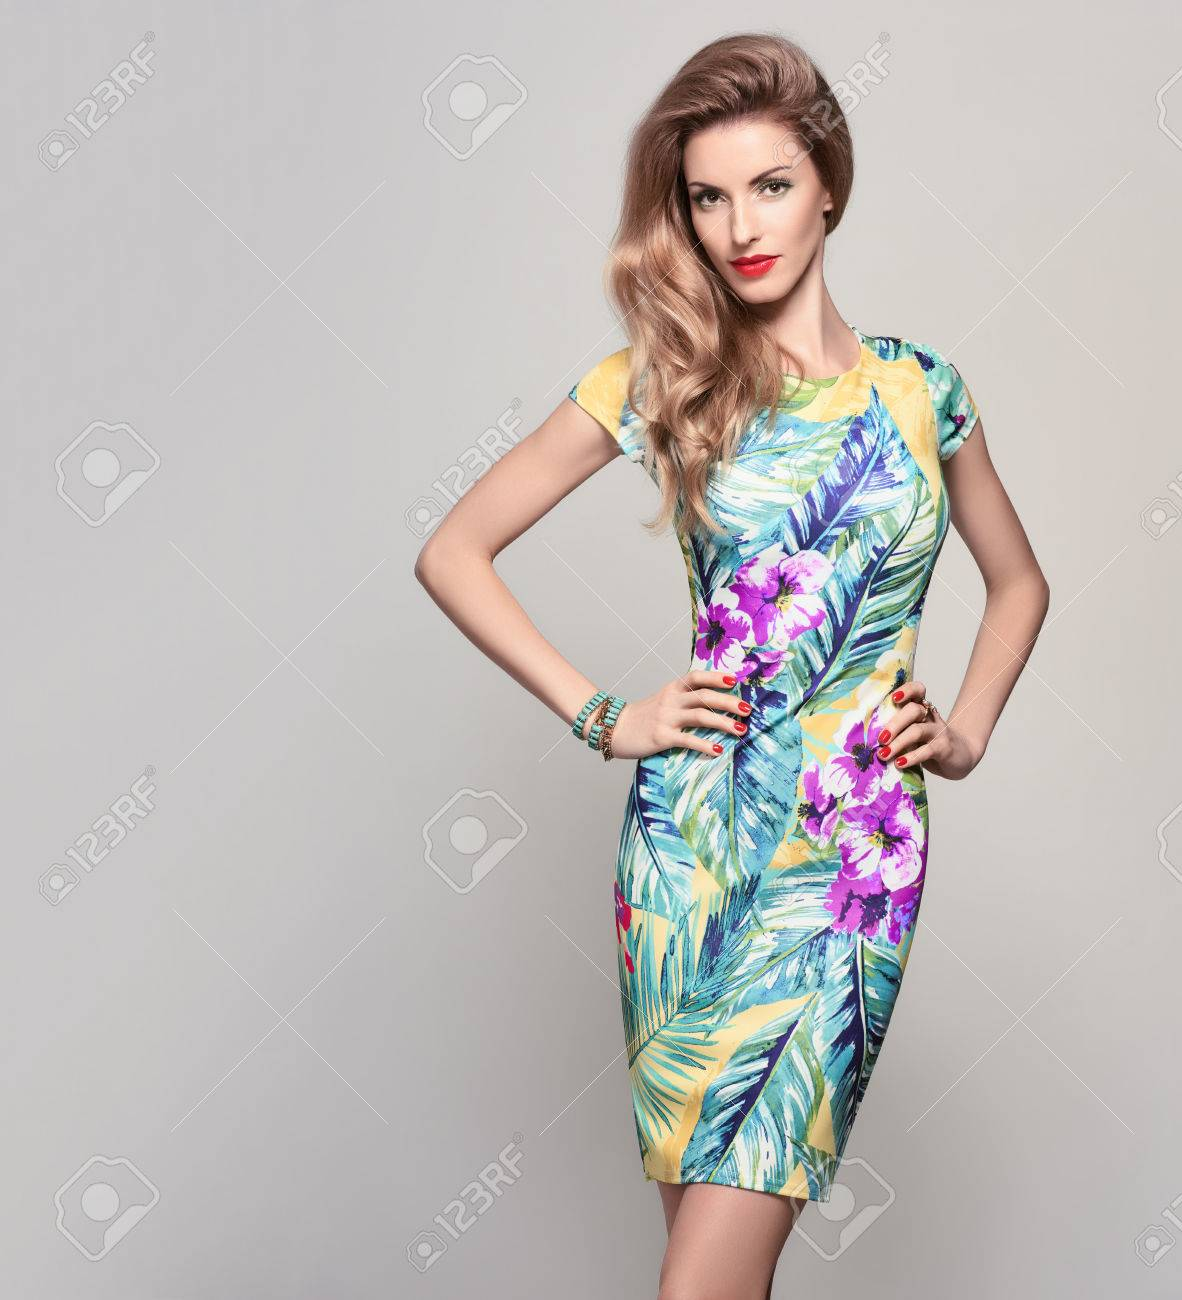 37ff8f0225a Fashion Woman In Trendy Spring Summer Dress. Stylish Wavy Hairstyle ...